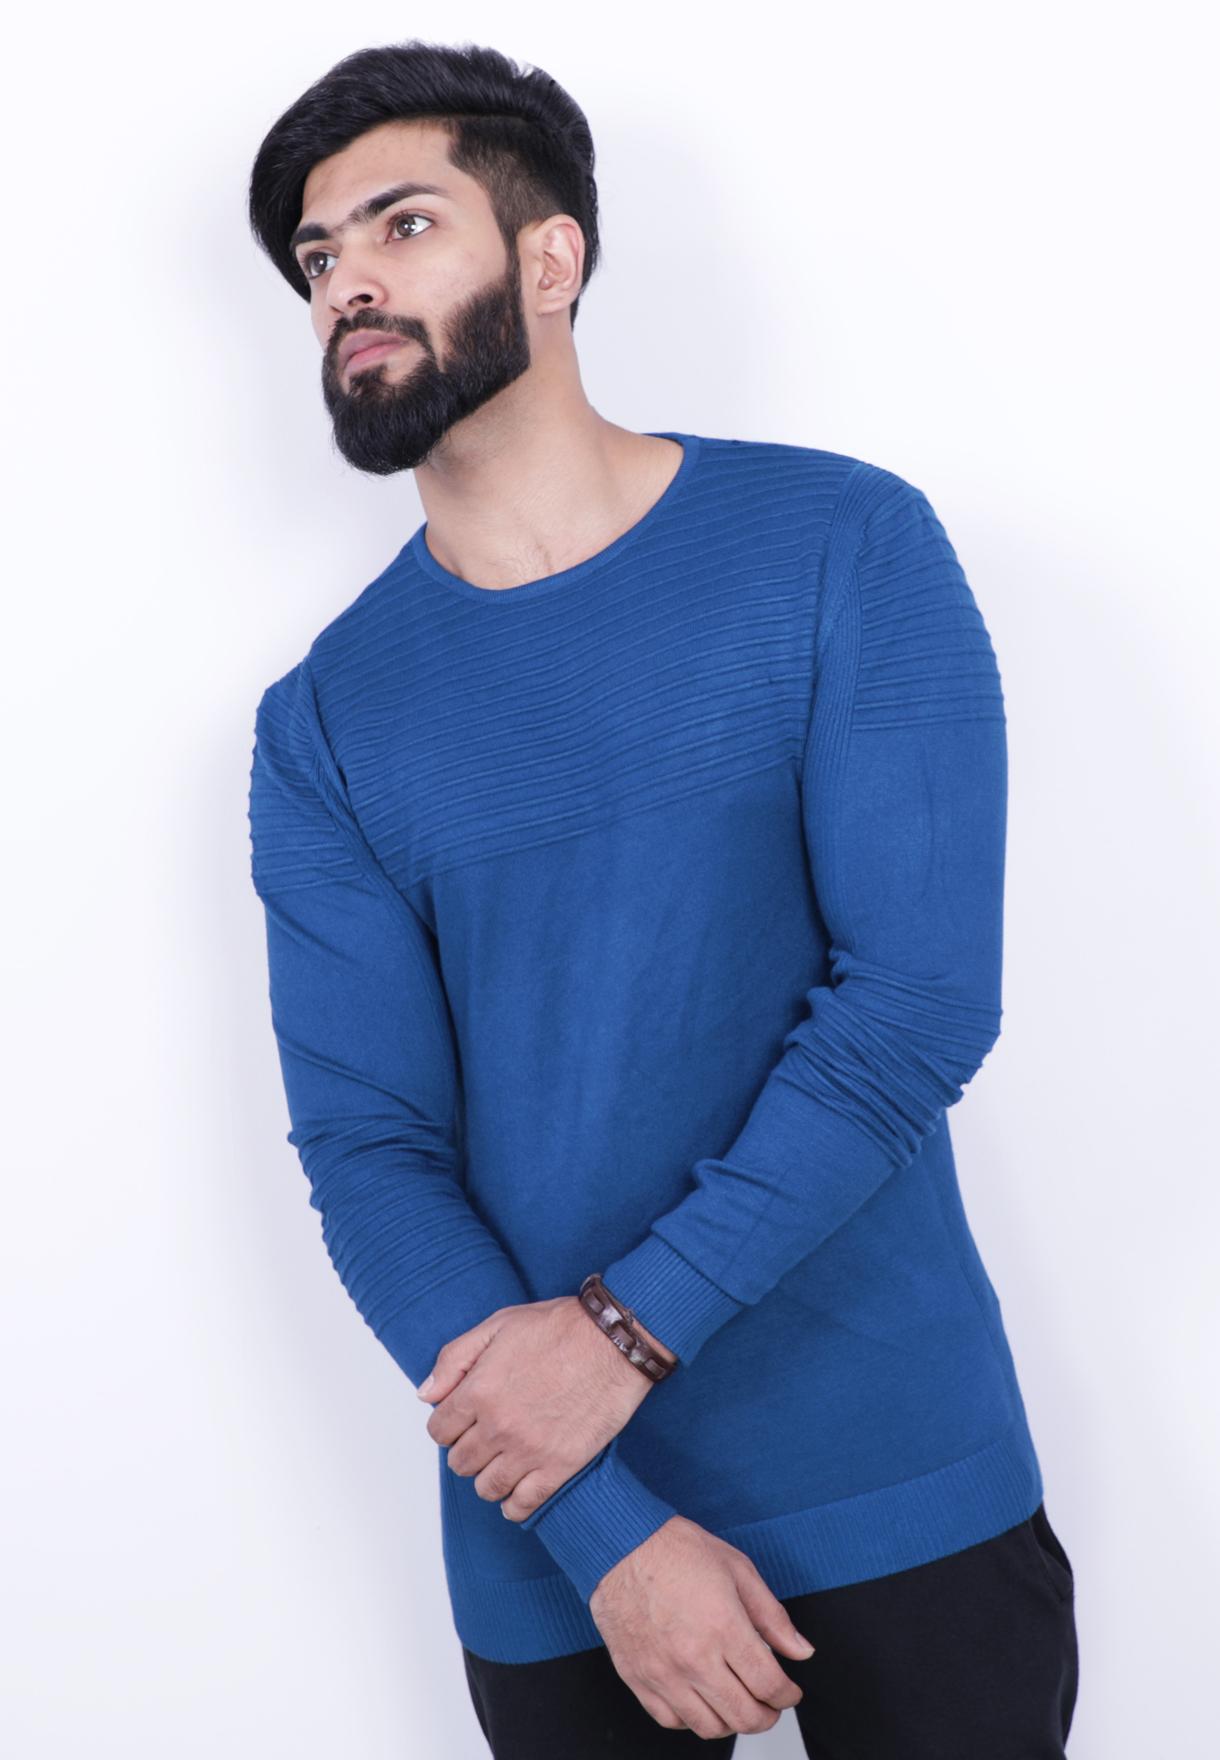 Score Jeans Mens Sweater Full Sleev Blue - HF533 - L